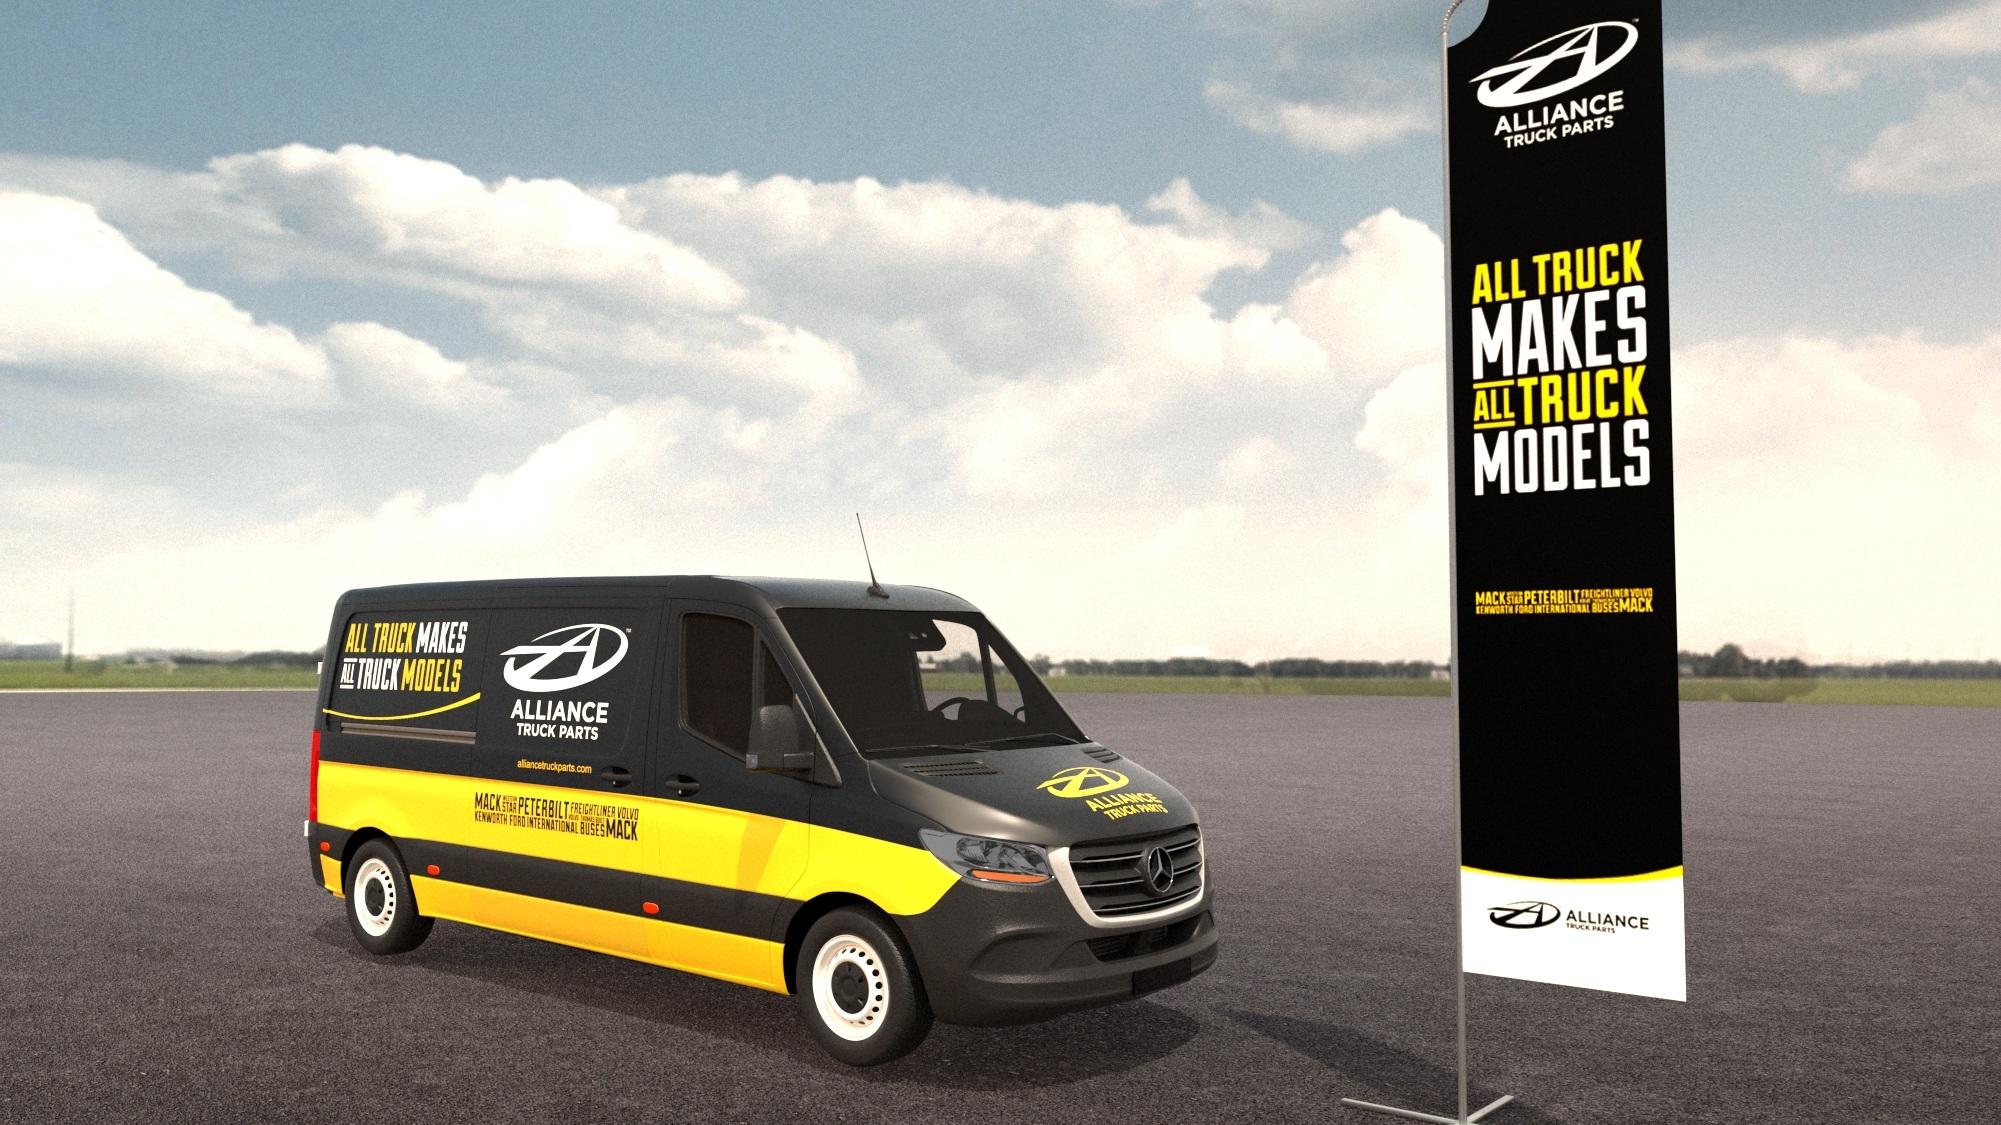 Daimler Trucks N.A. - Alliance Sales Training Vehicle